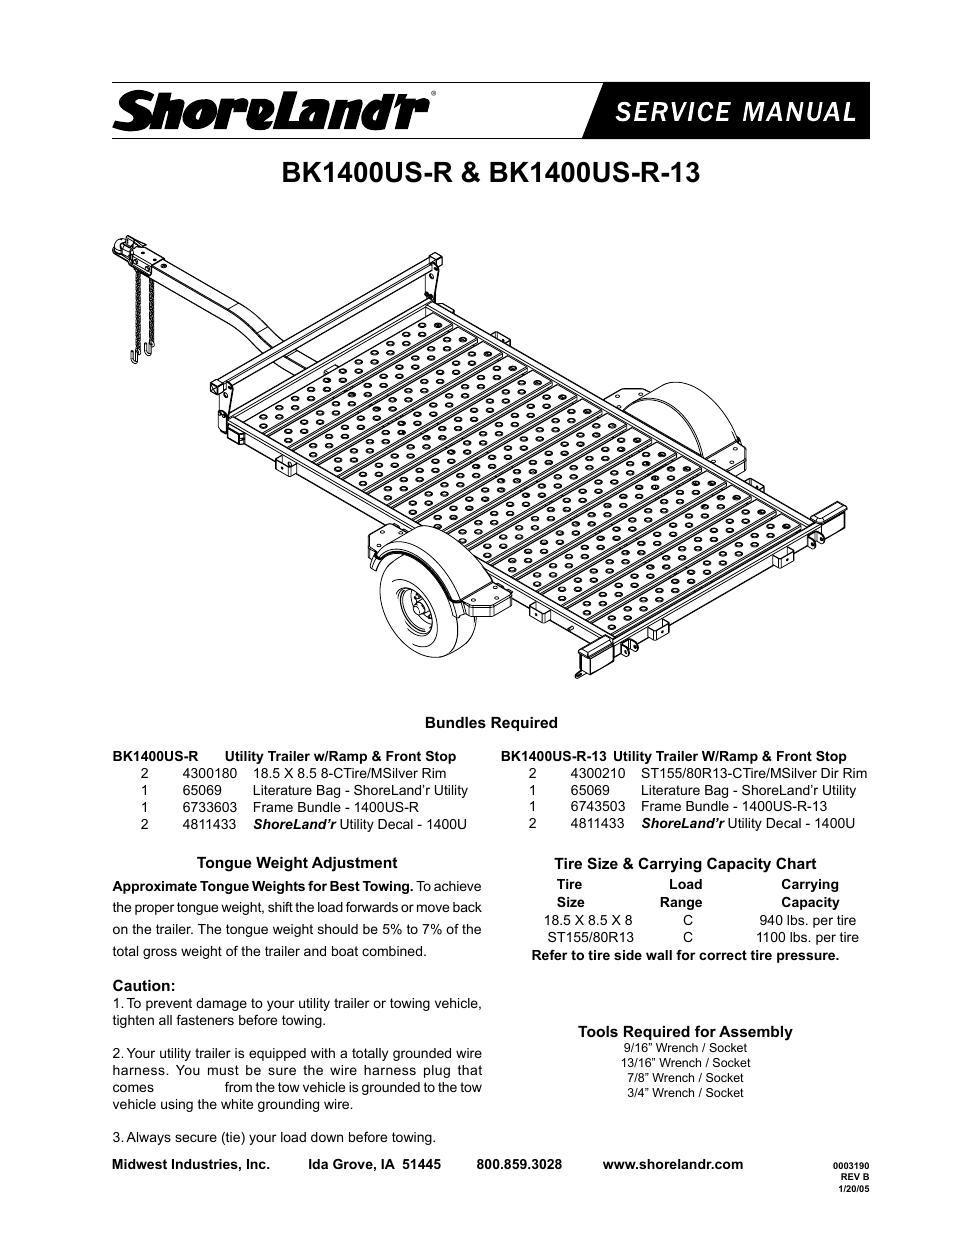 shoreland'r bk1400us-r v 2 user manual  shoreland'r trailers